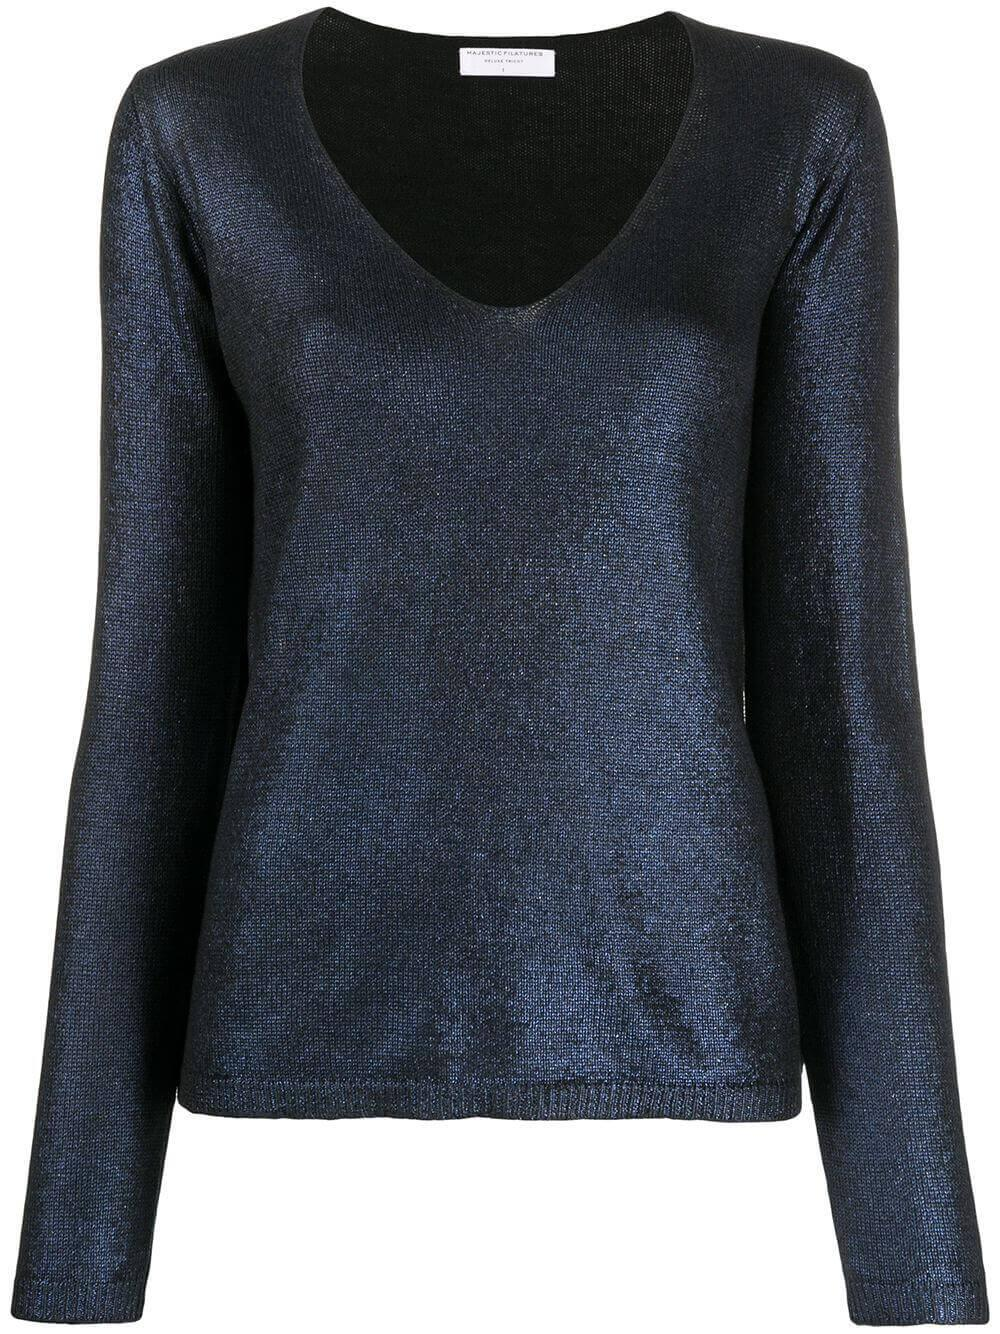 Metallic V- Neck Sweater Item # K069-FPU176